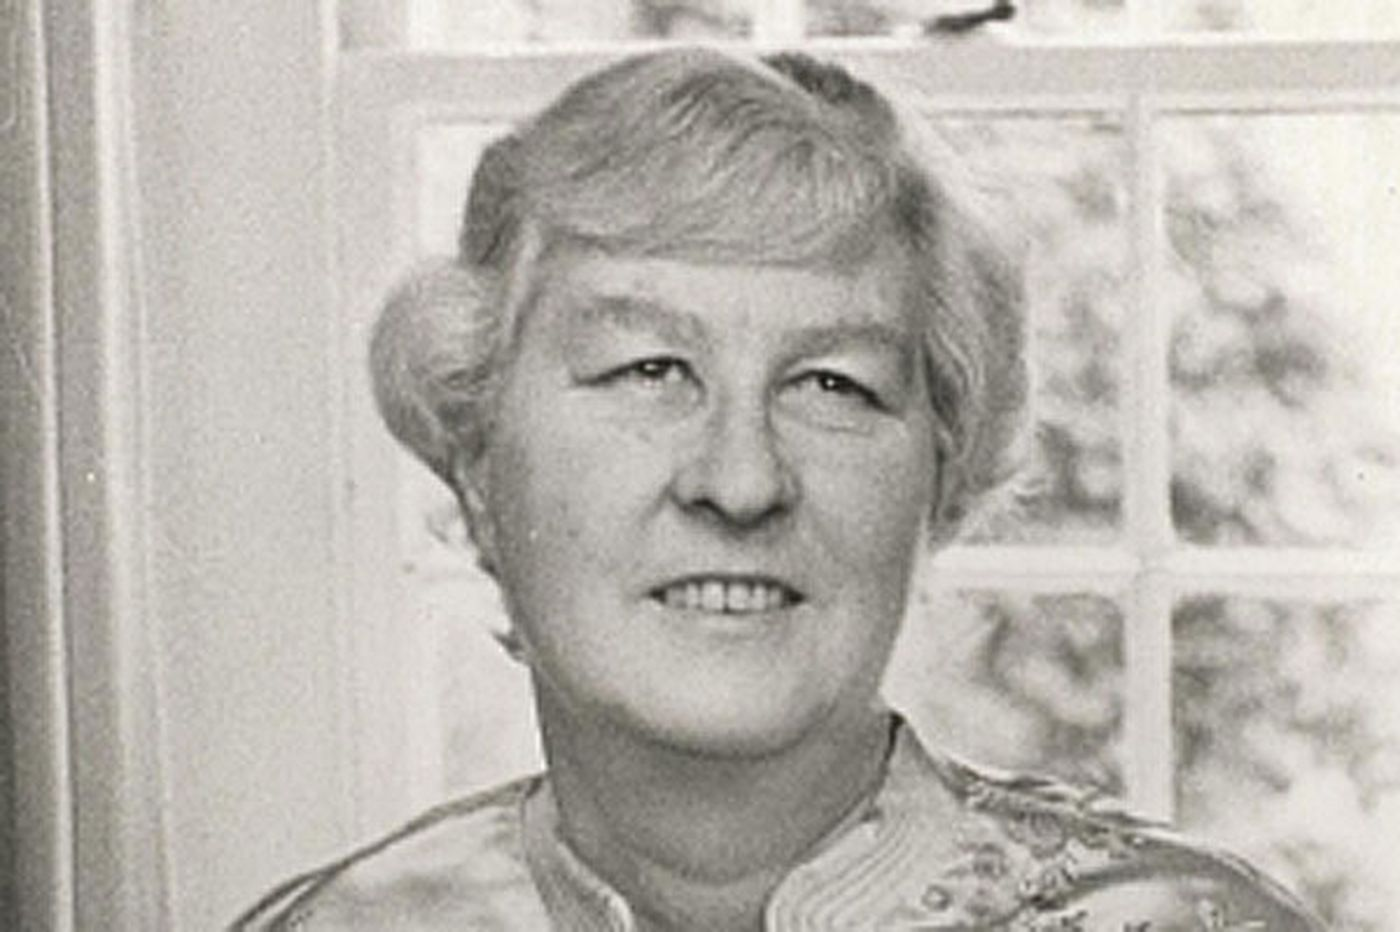 Janice Comfort Walsh, 90, Pearl Buck's daughter